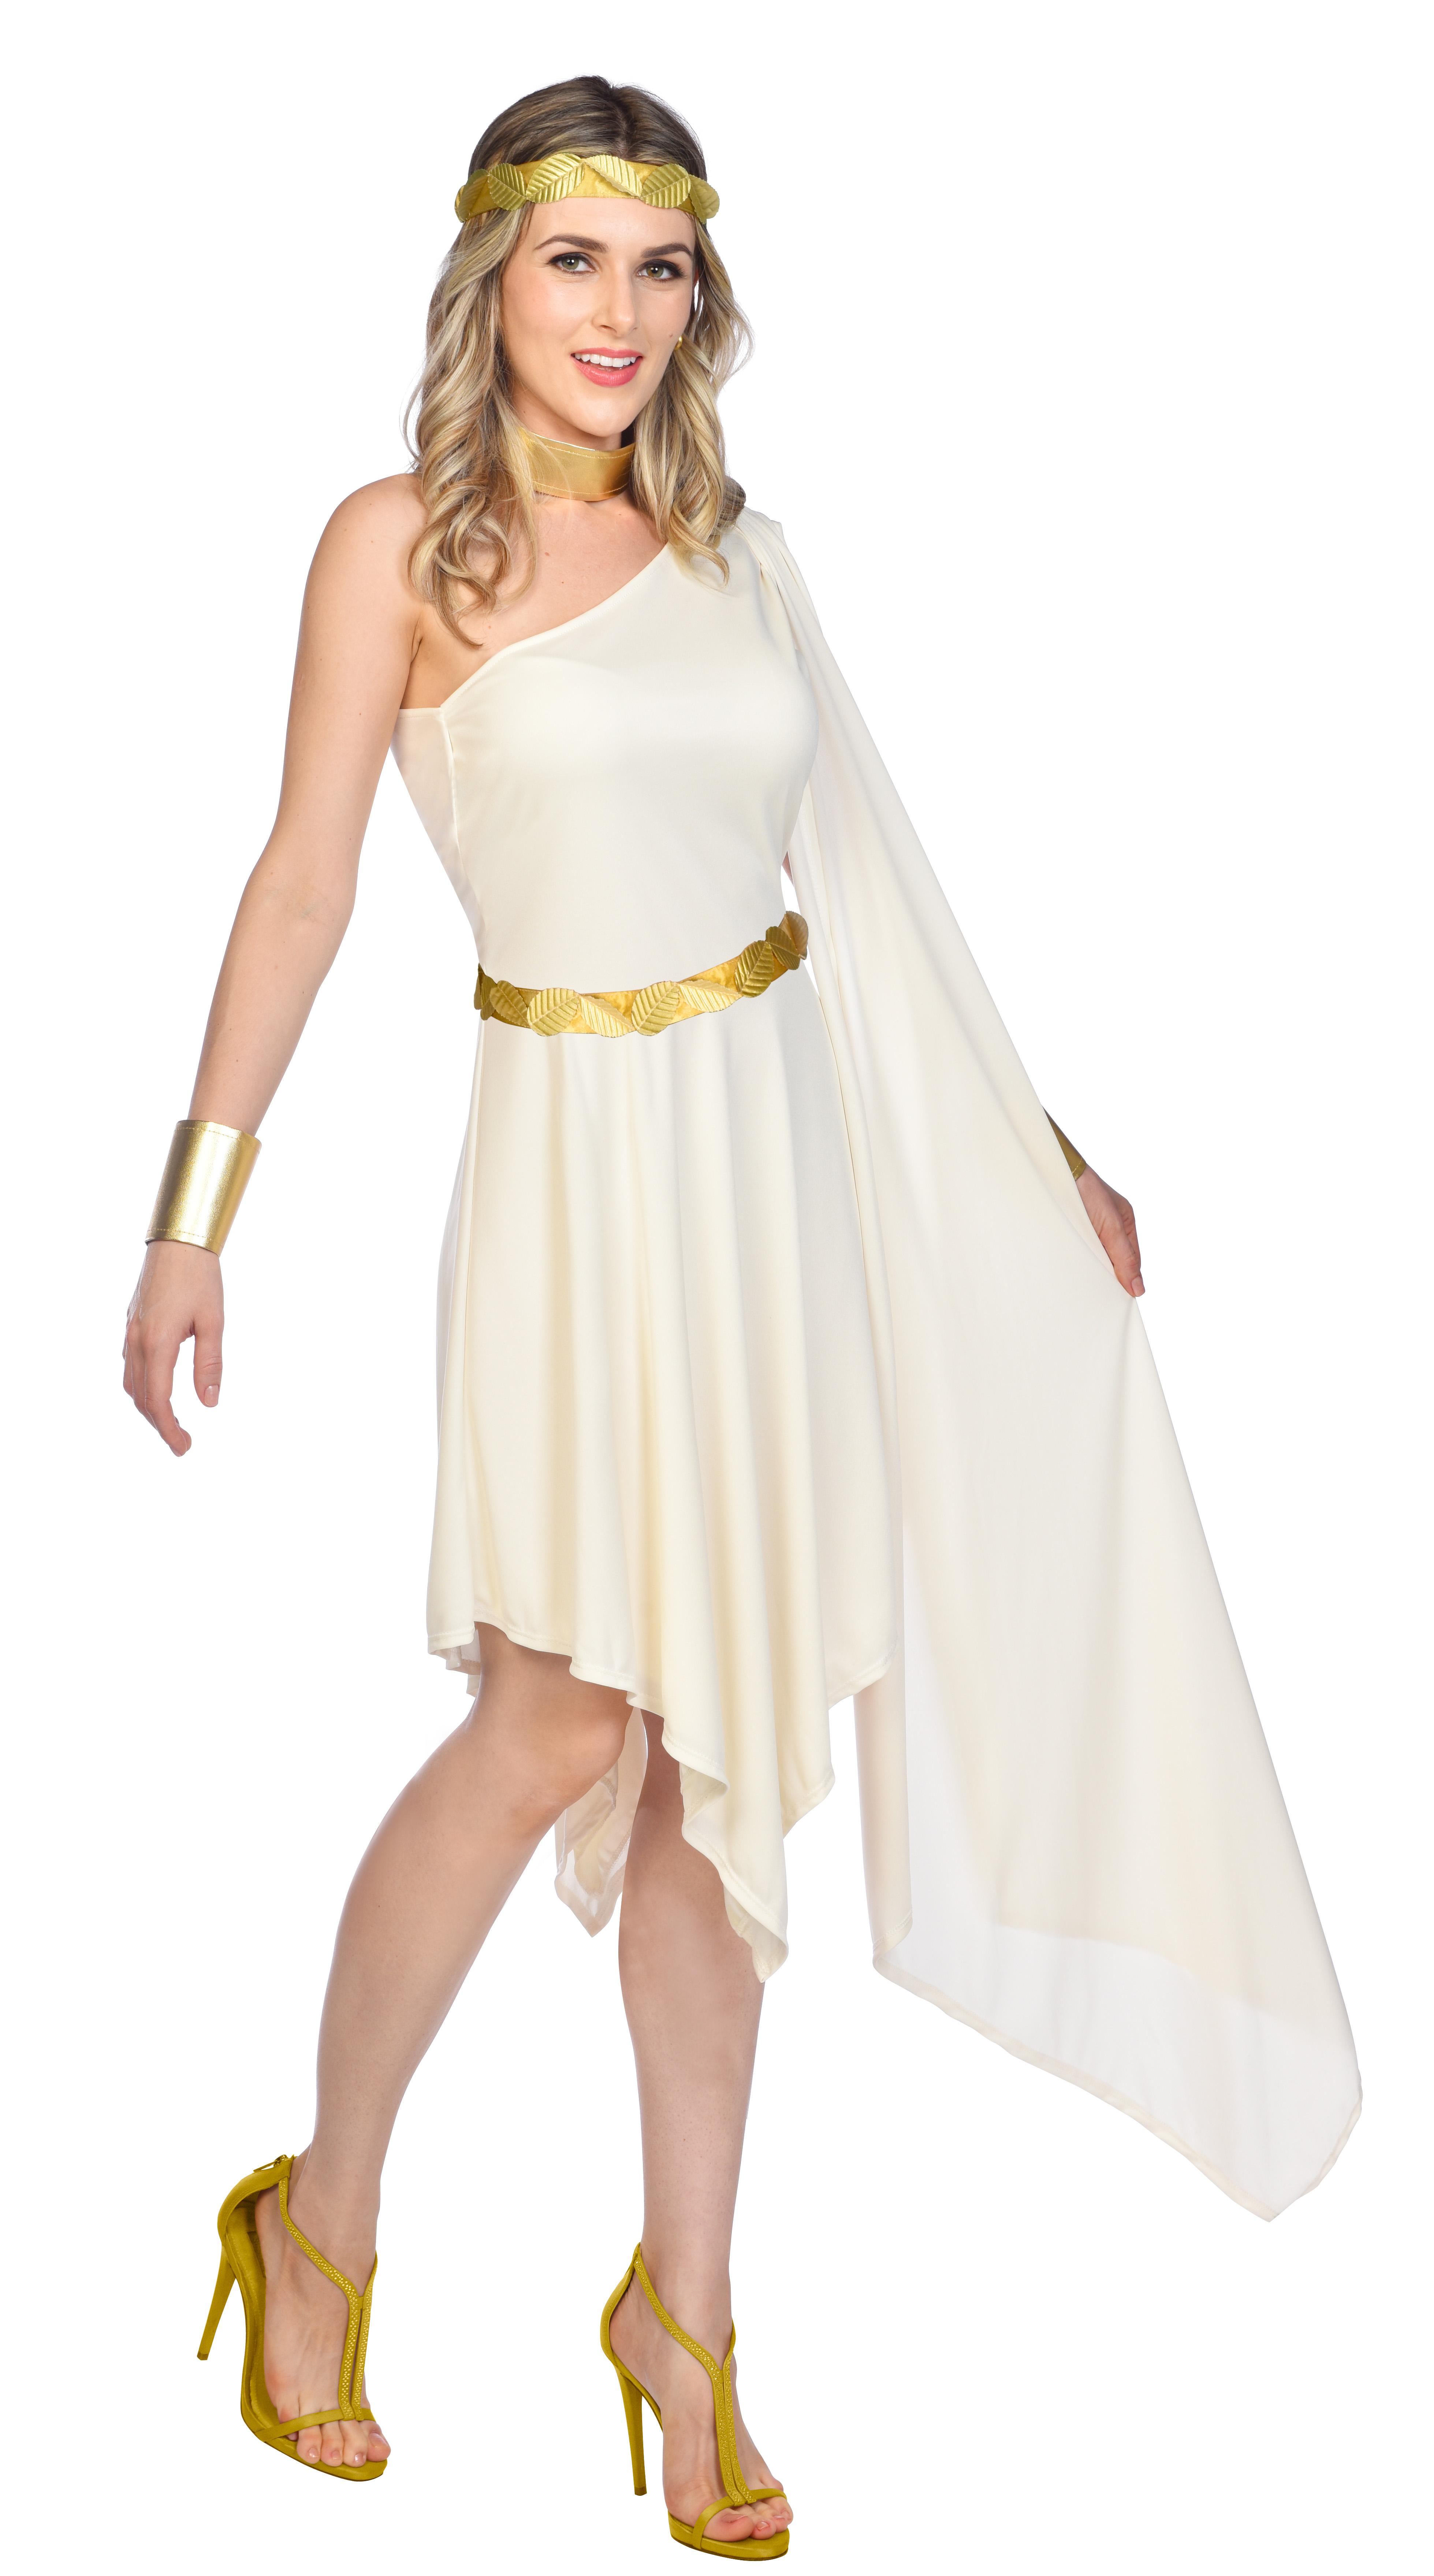 Indexbild 14 - Adult Ladies Golden Goddess Gladiator Greek Roman Toga Fancy Dress Costume New